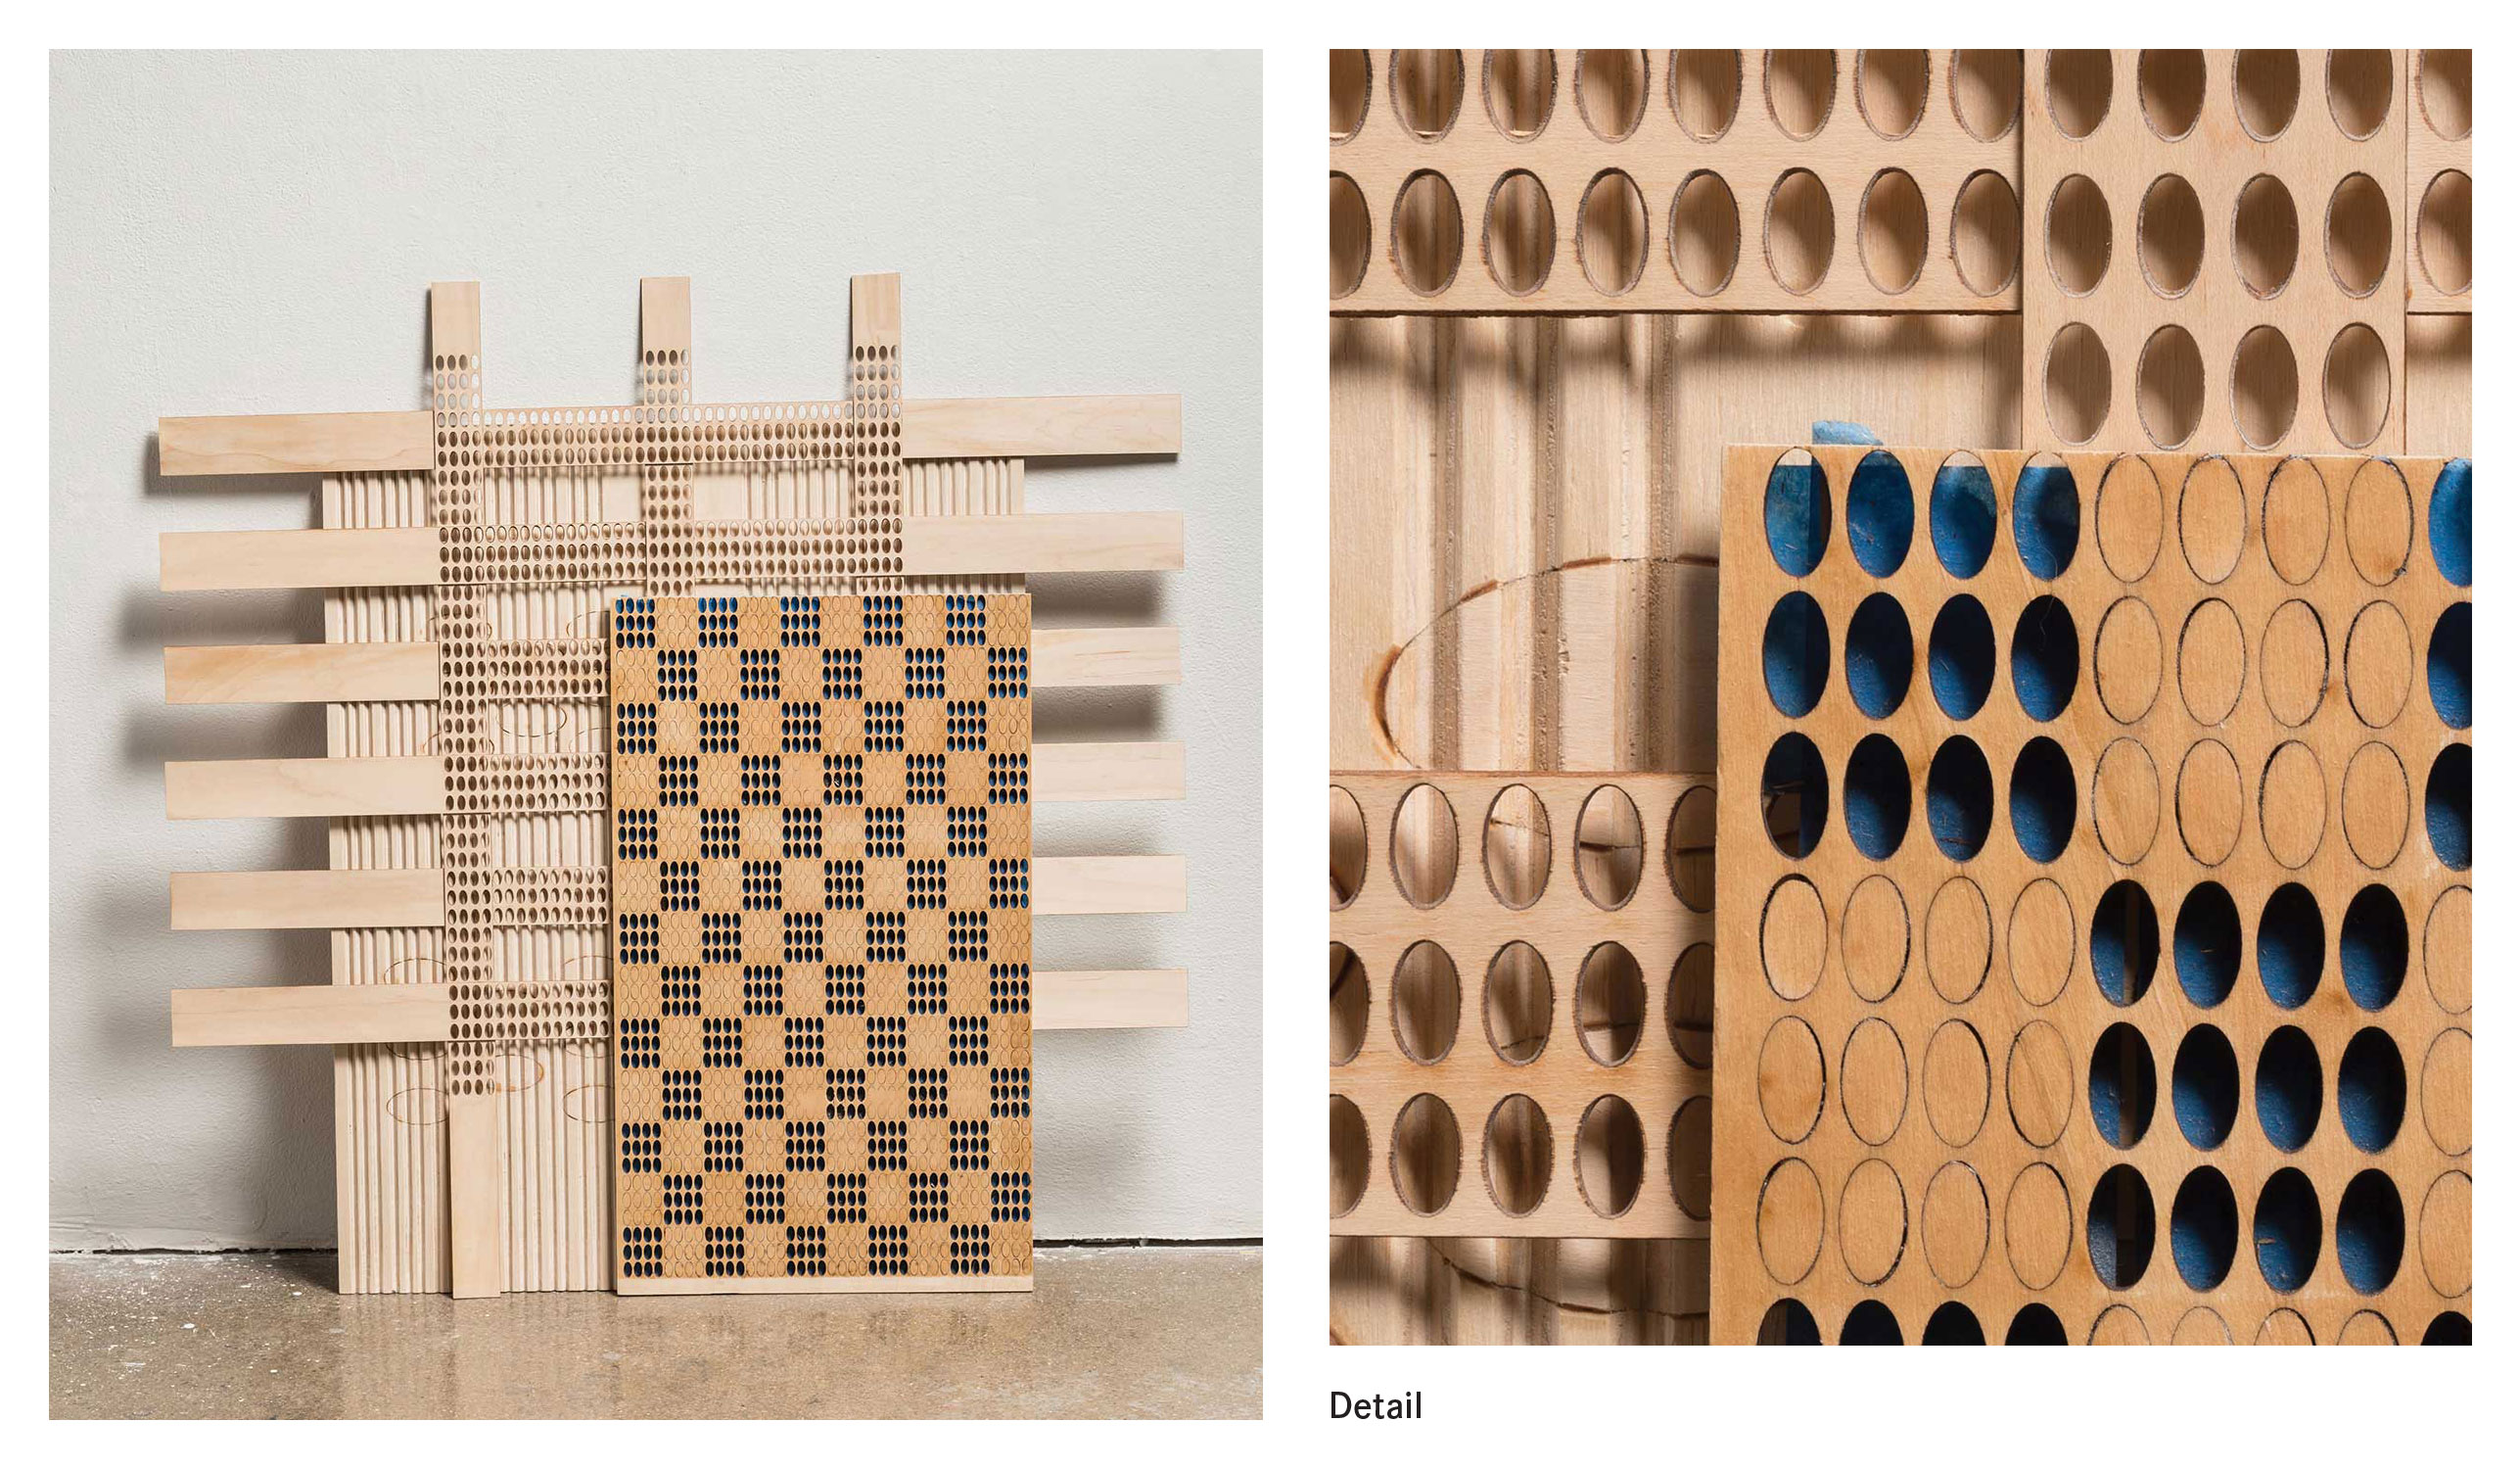 Shelly McMahon - Boards (Patch Board, Trellis, Tape Board)